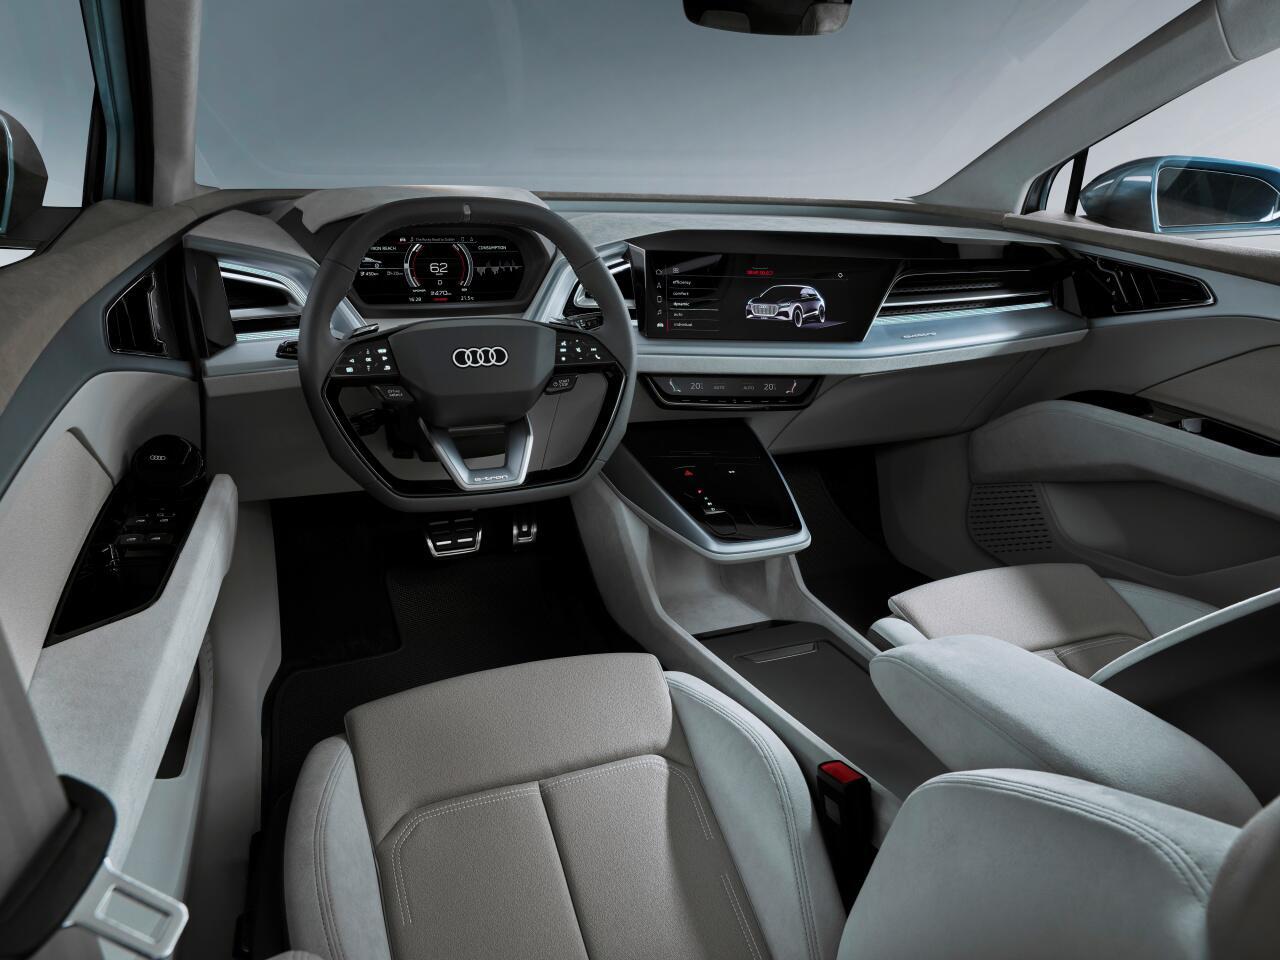 Bild zu Augmented Audi-Reality